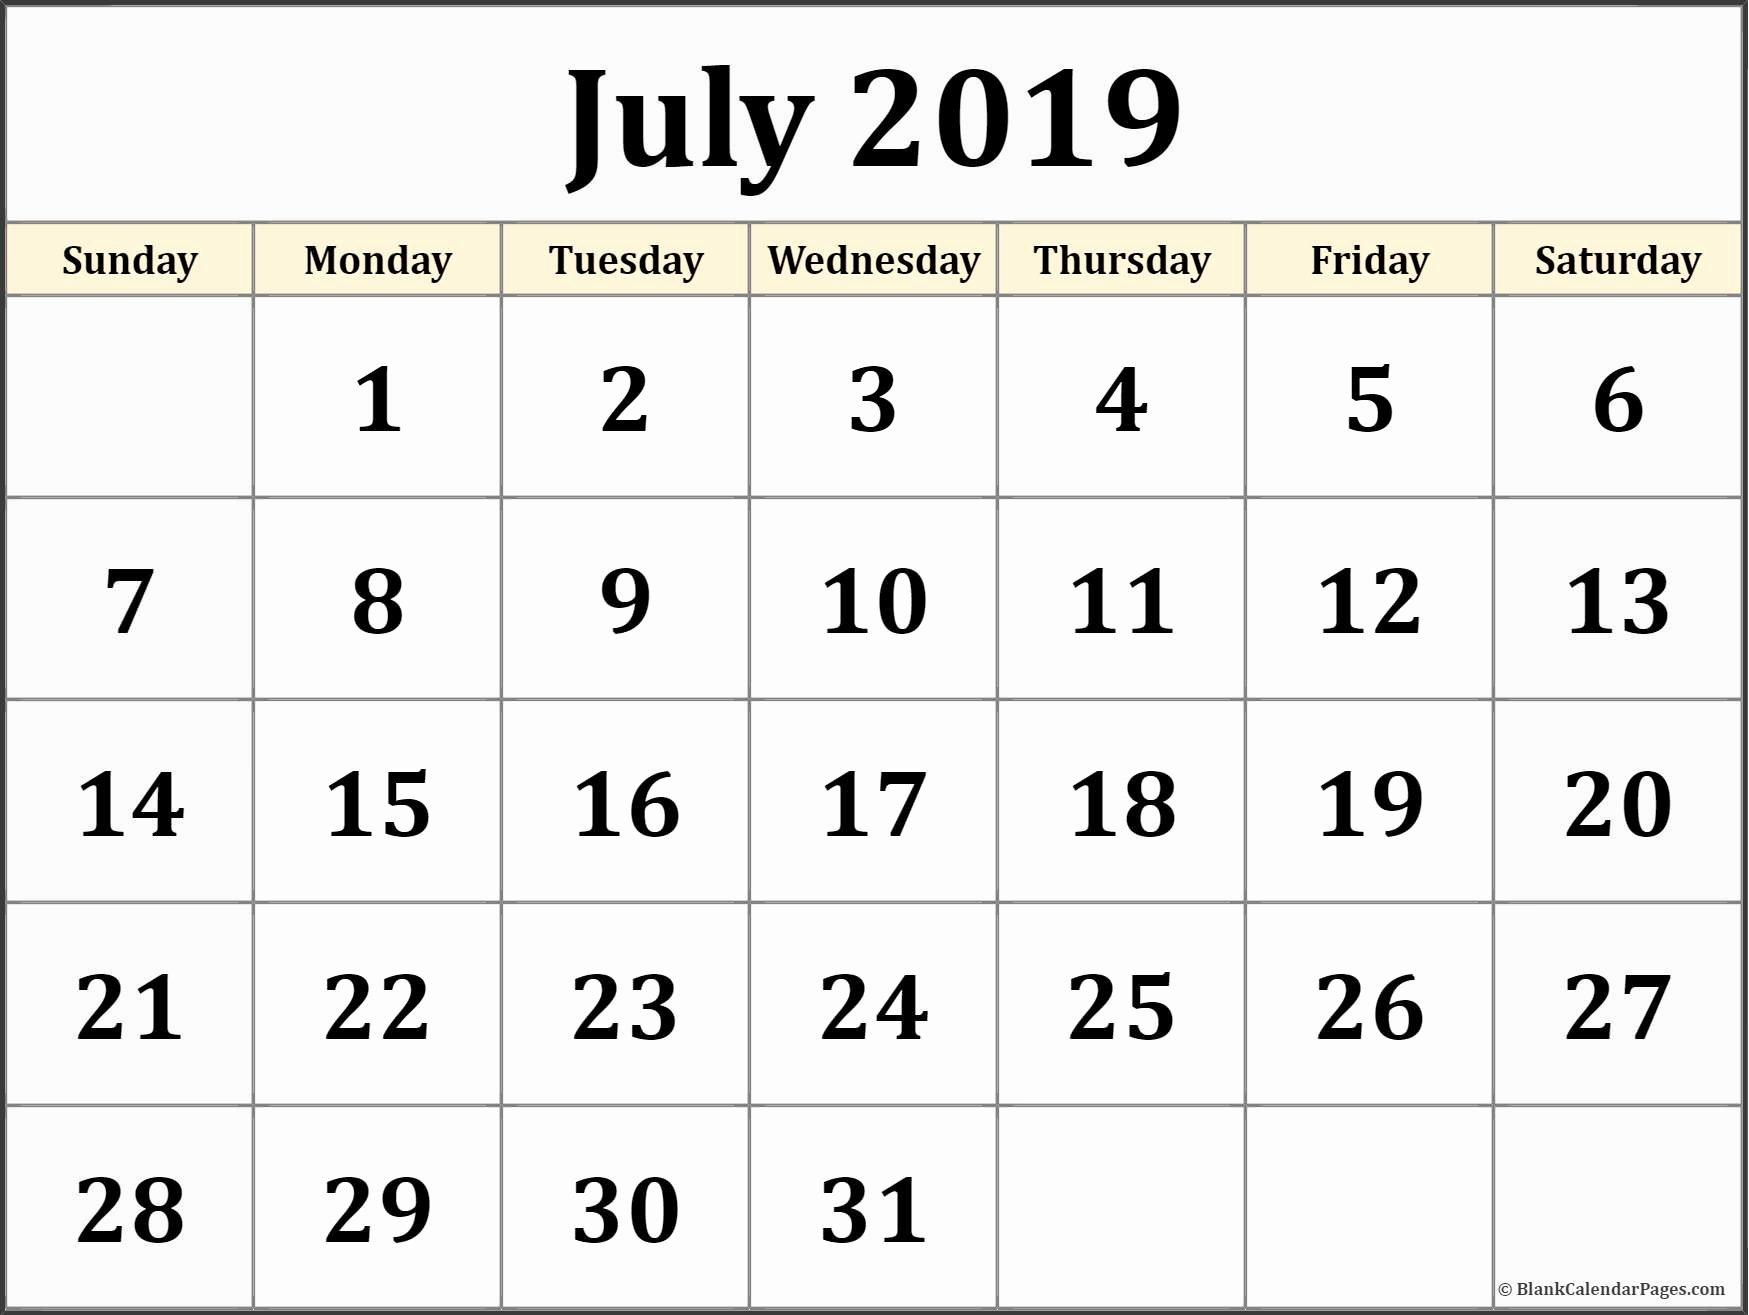 July 2019 Calendar Pdf - Free Printable Calendar, Templates And Holidays July 1 2019 Calendar